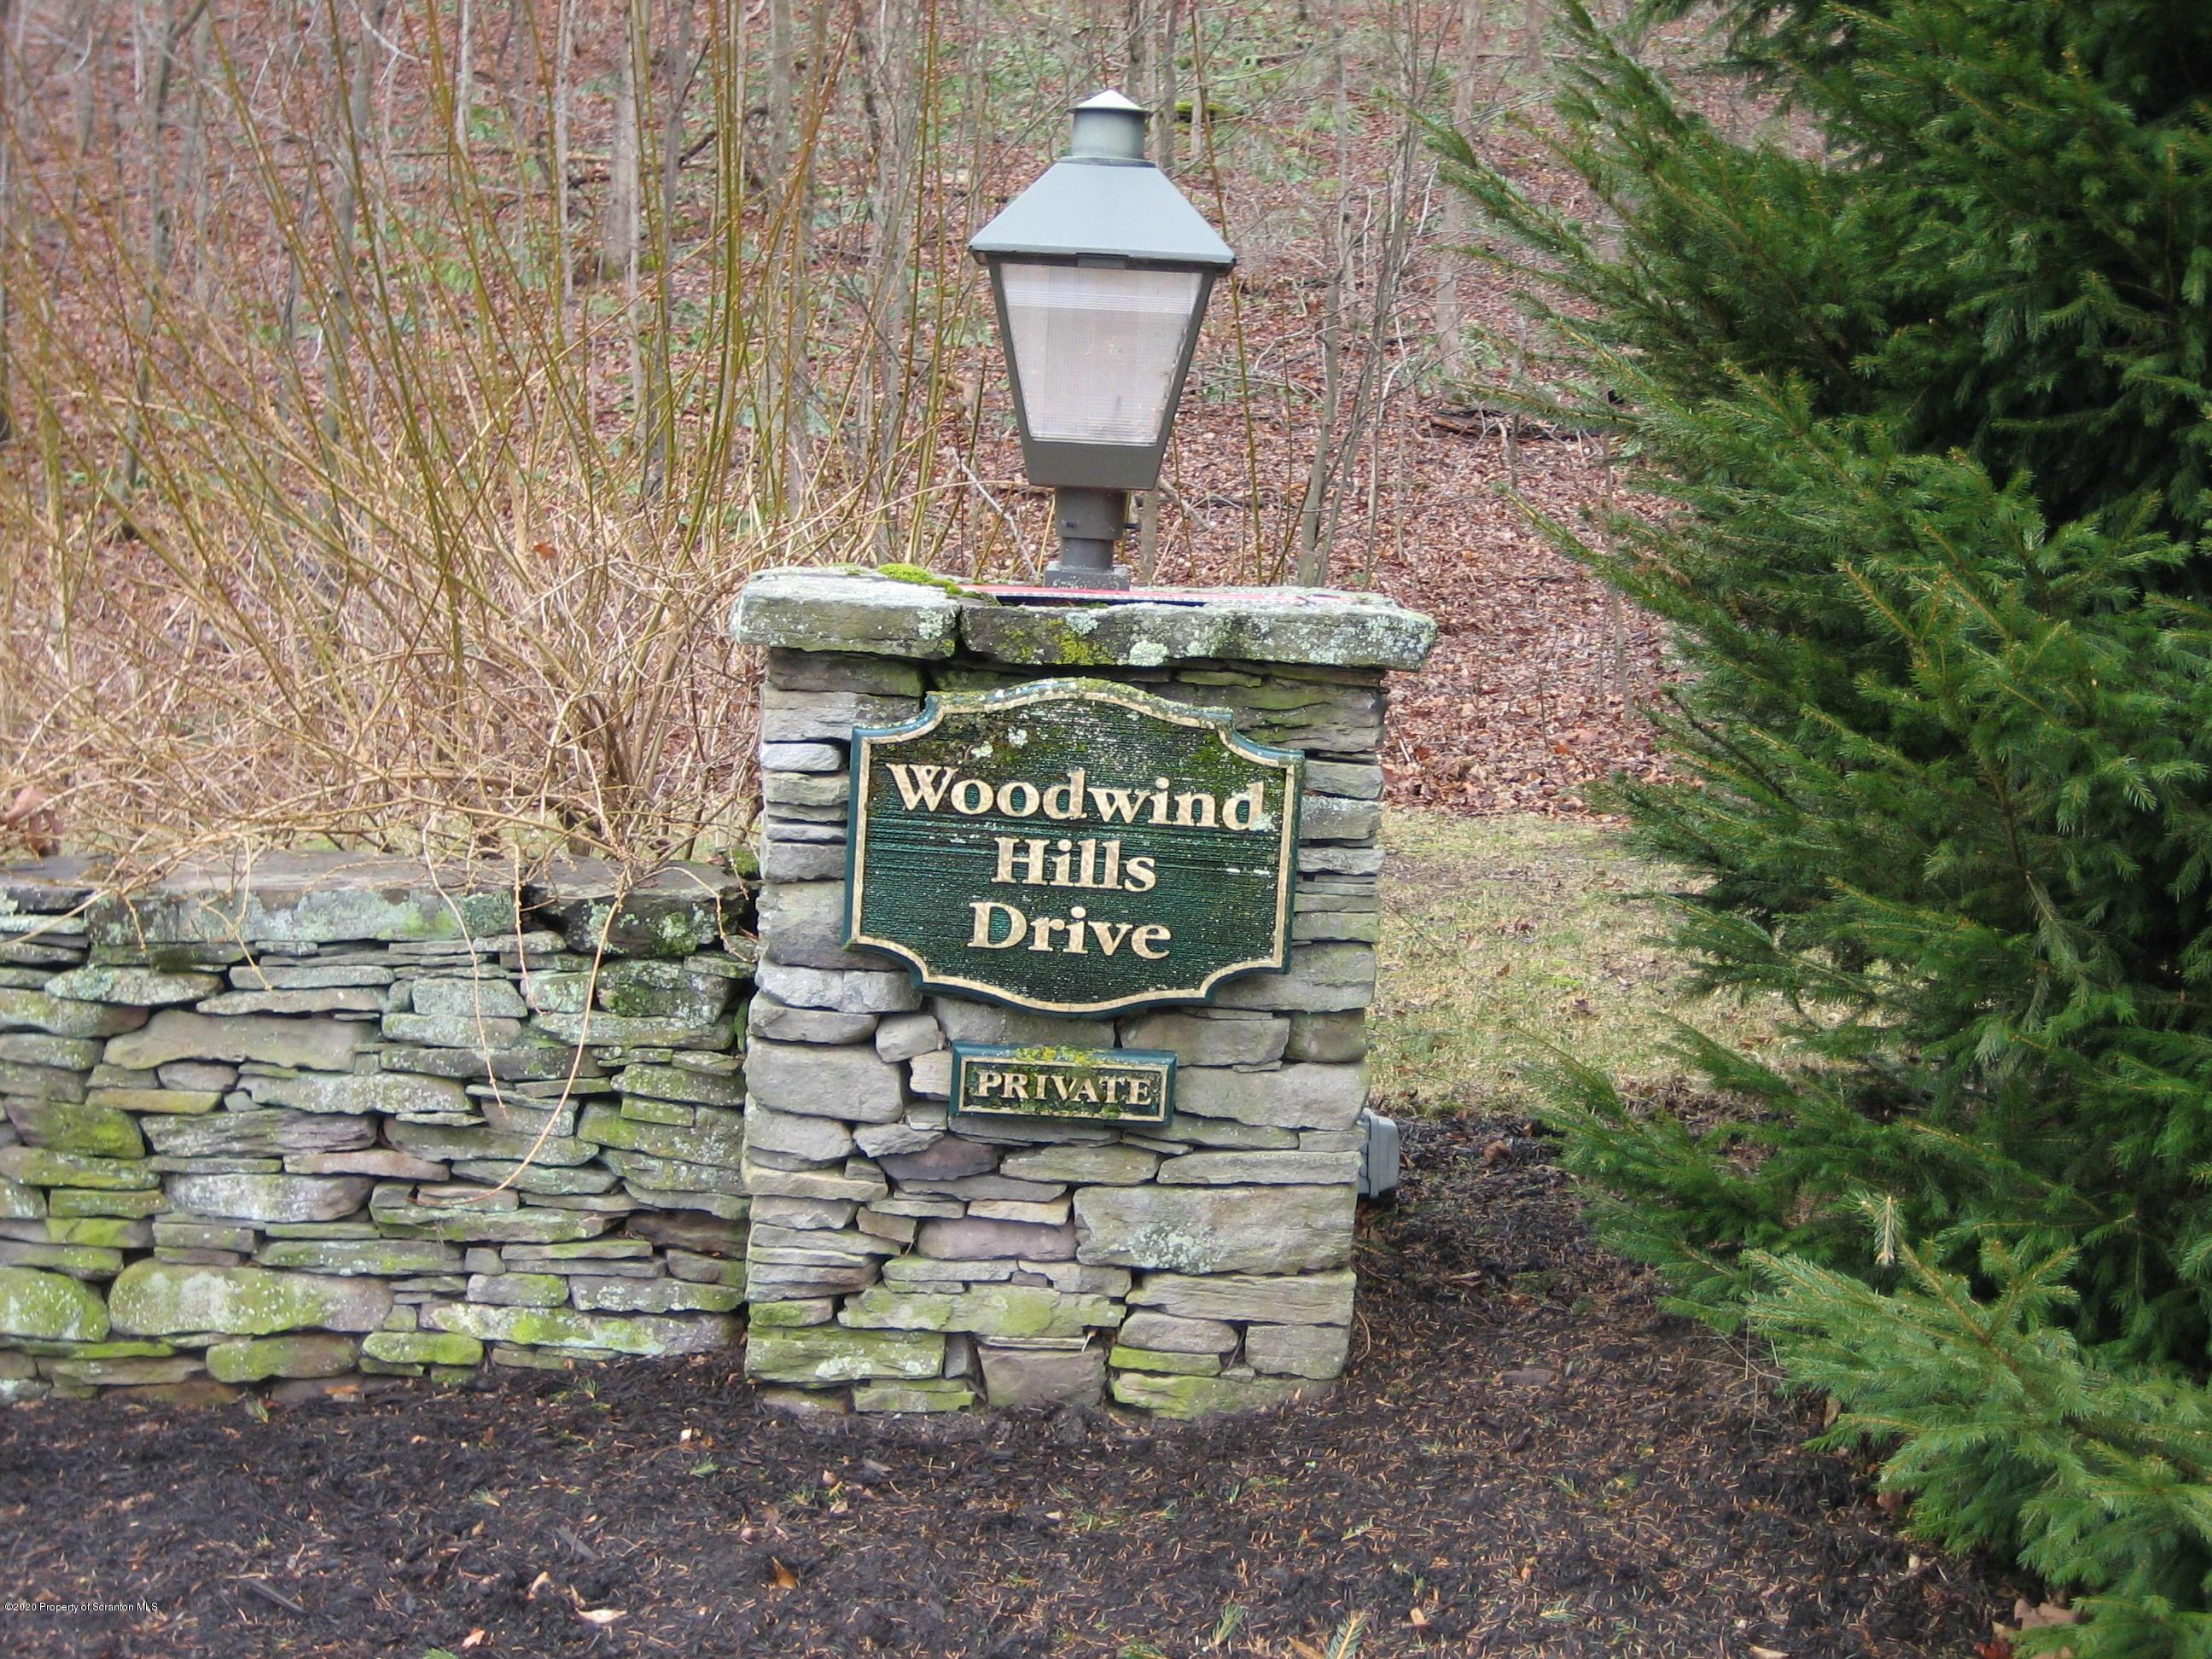 1013 Woodwind Hills Dr, Dalton, Pennsylvania 18414, ,Land,For Sale,Woodwind Hills,20-827